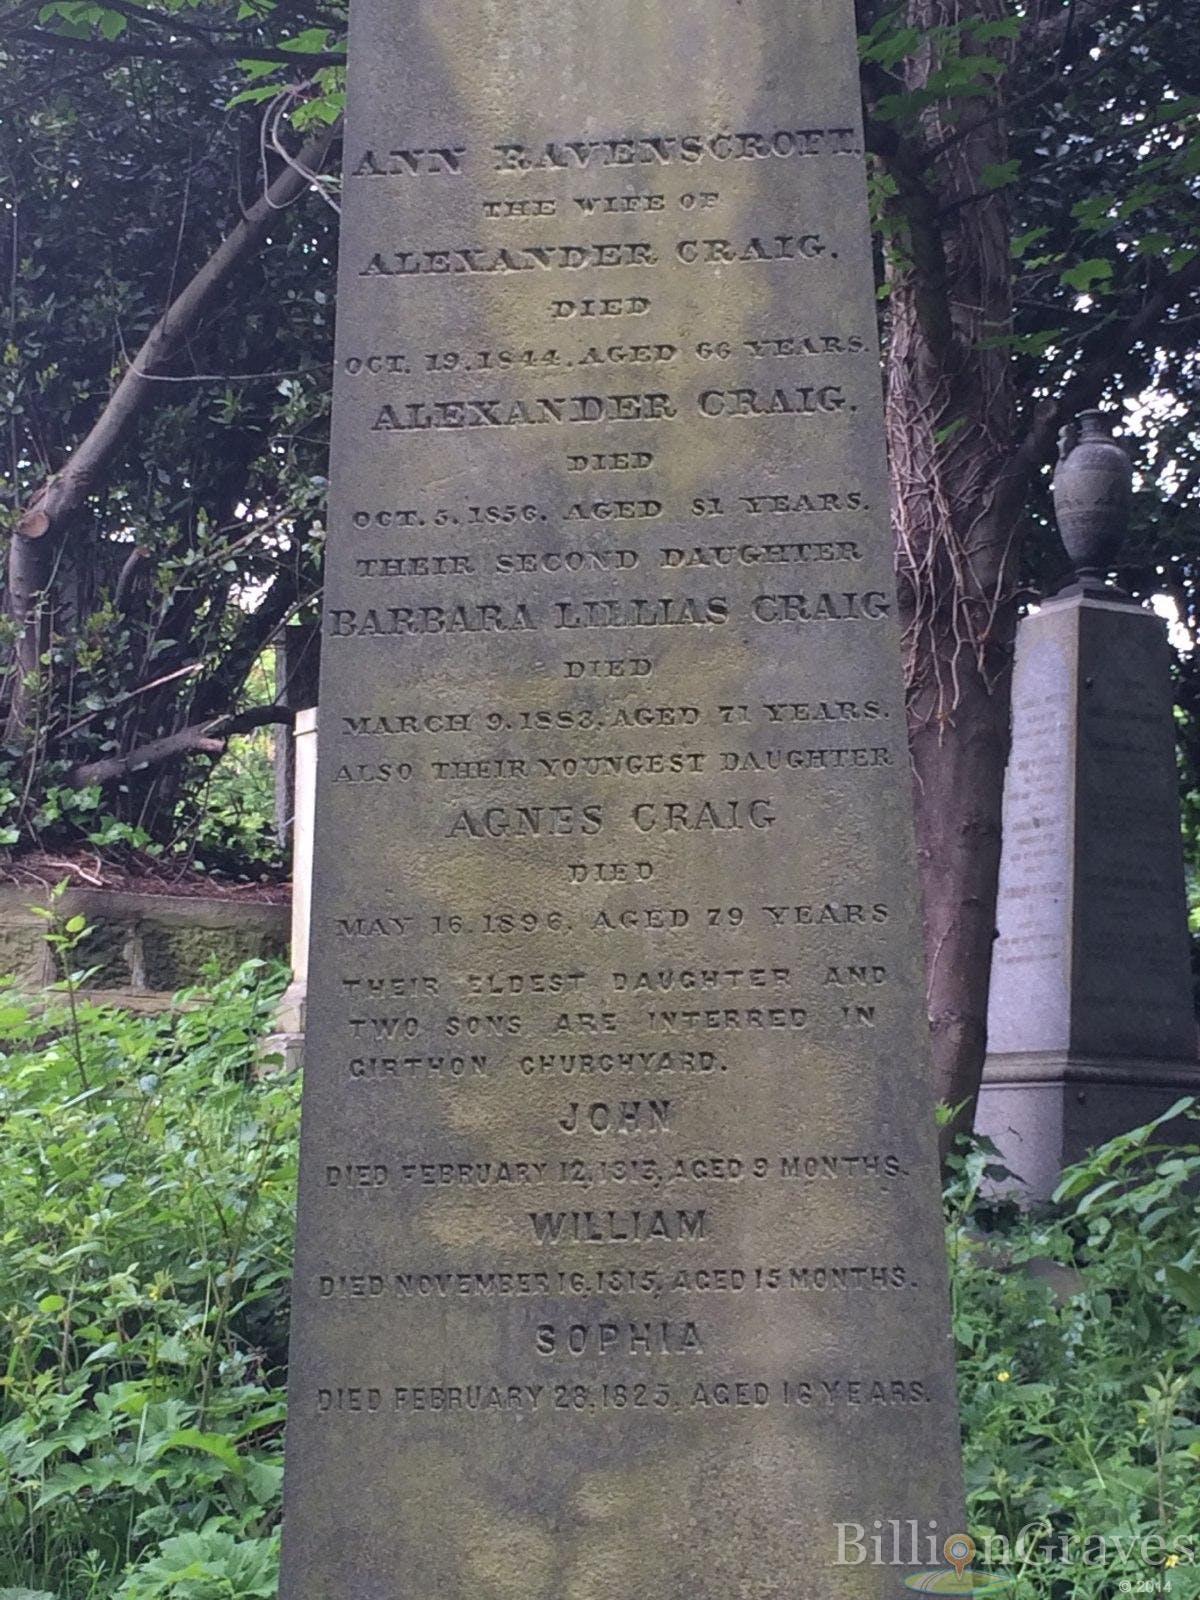 Scottish cemetery records